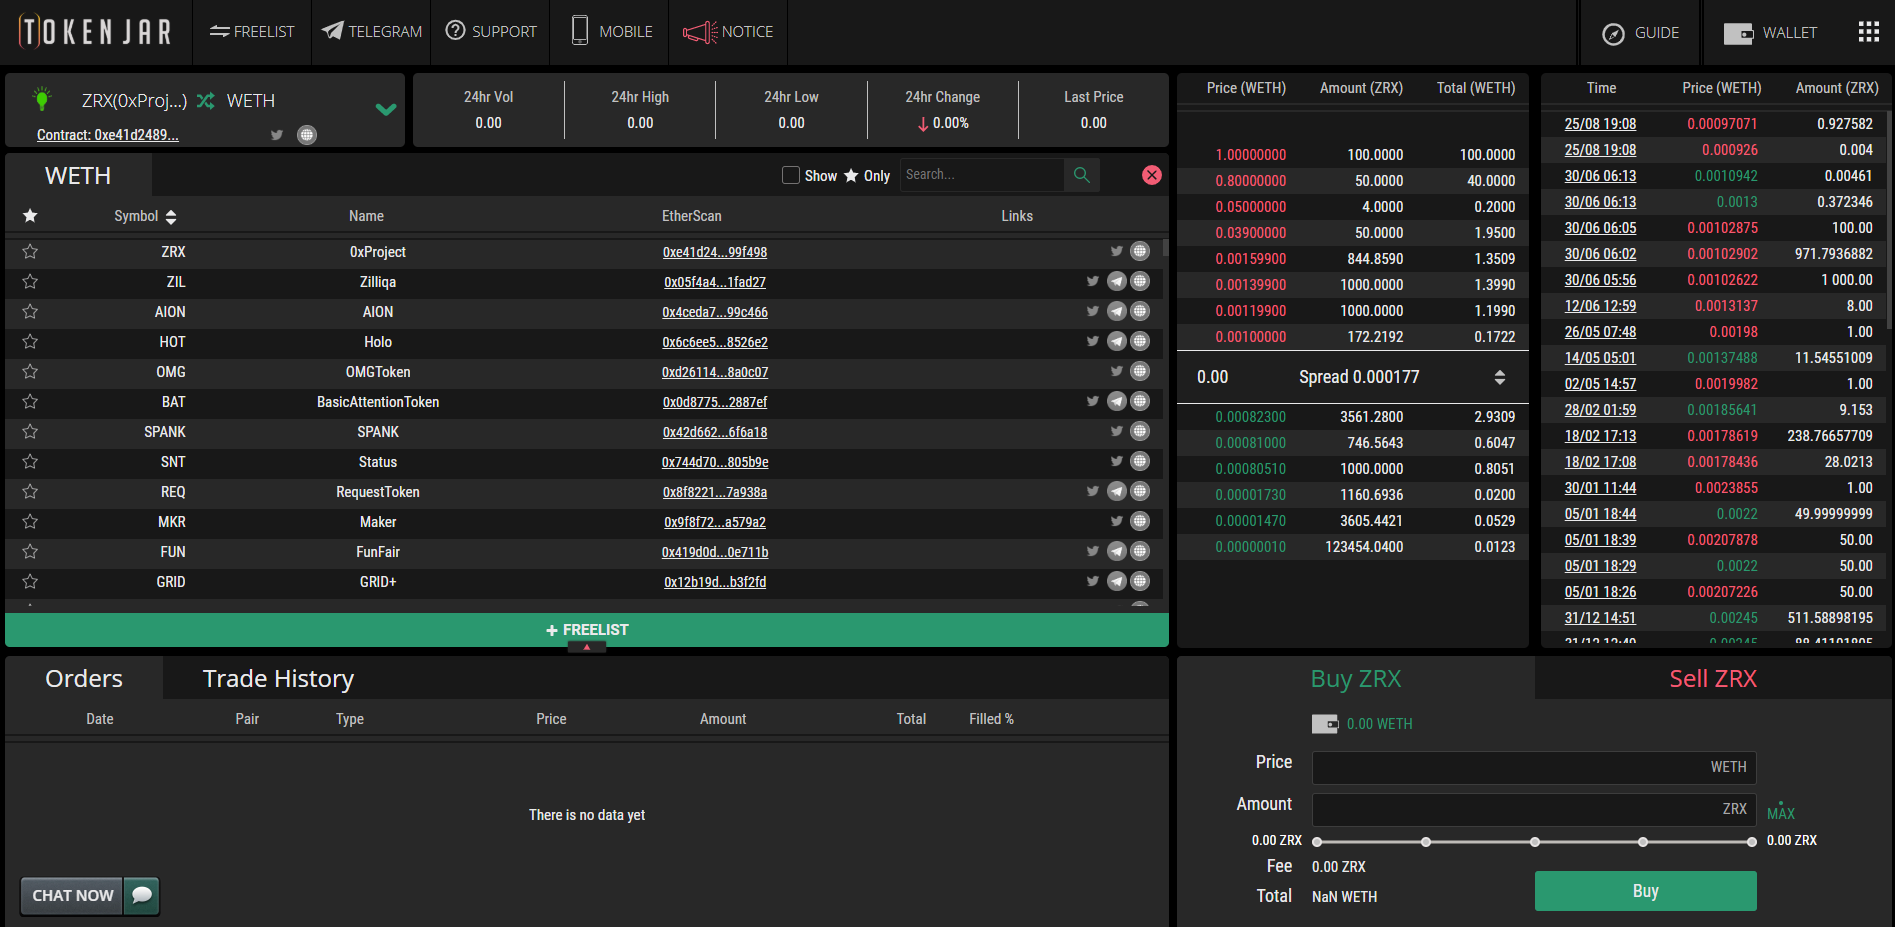 TokenJar Trading View